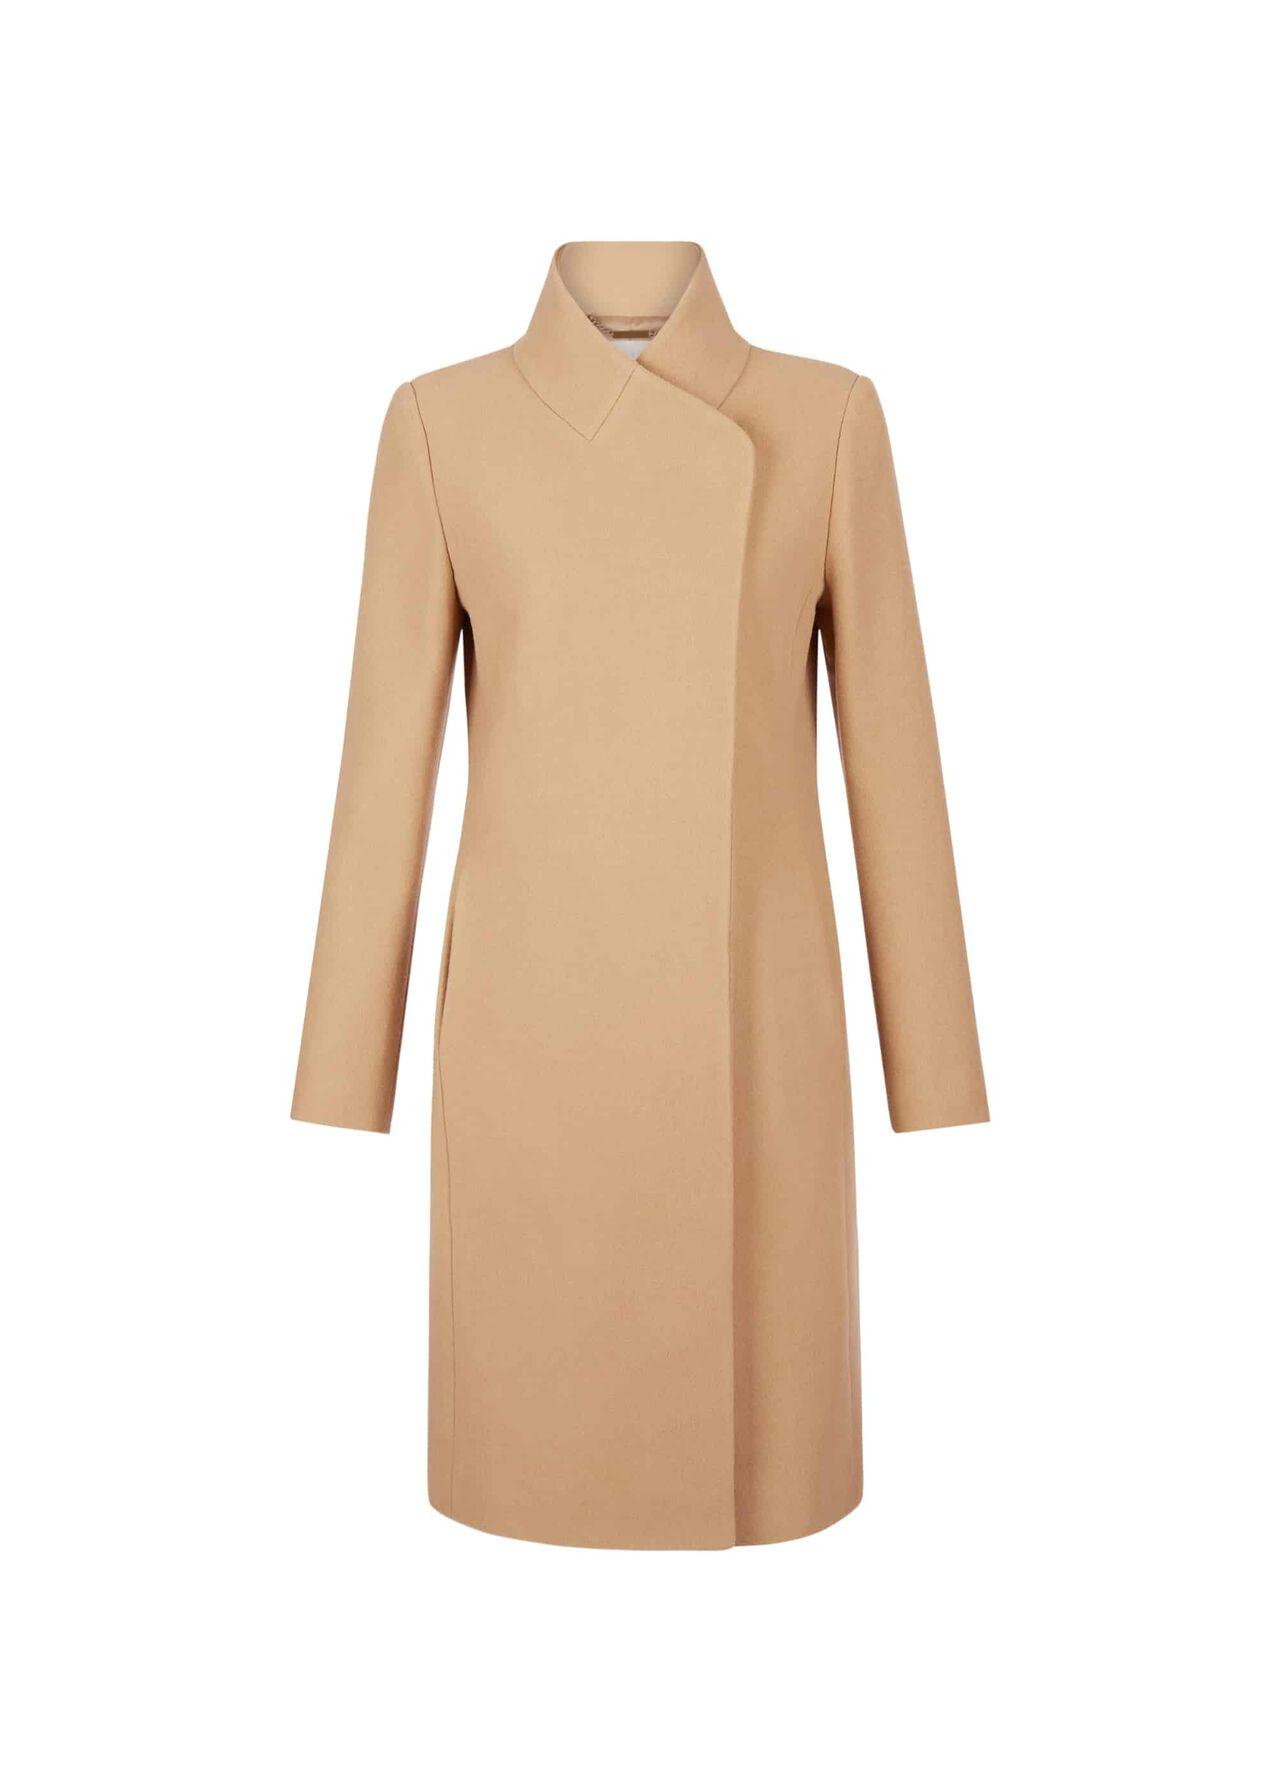 Petite Romy Wool Blend Coat Camel